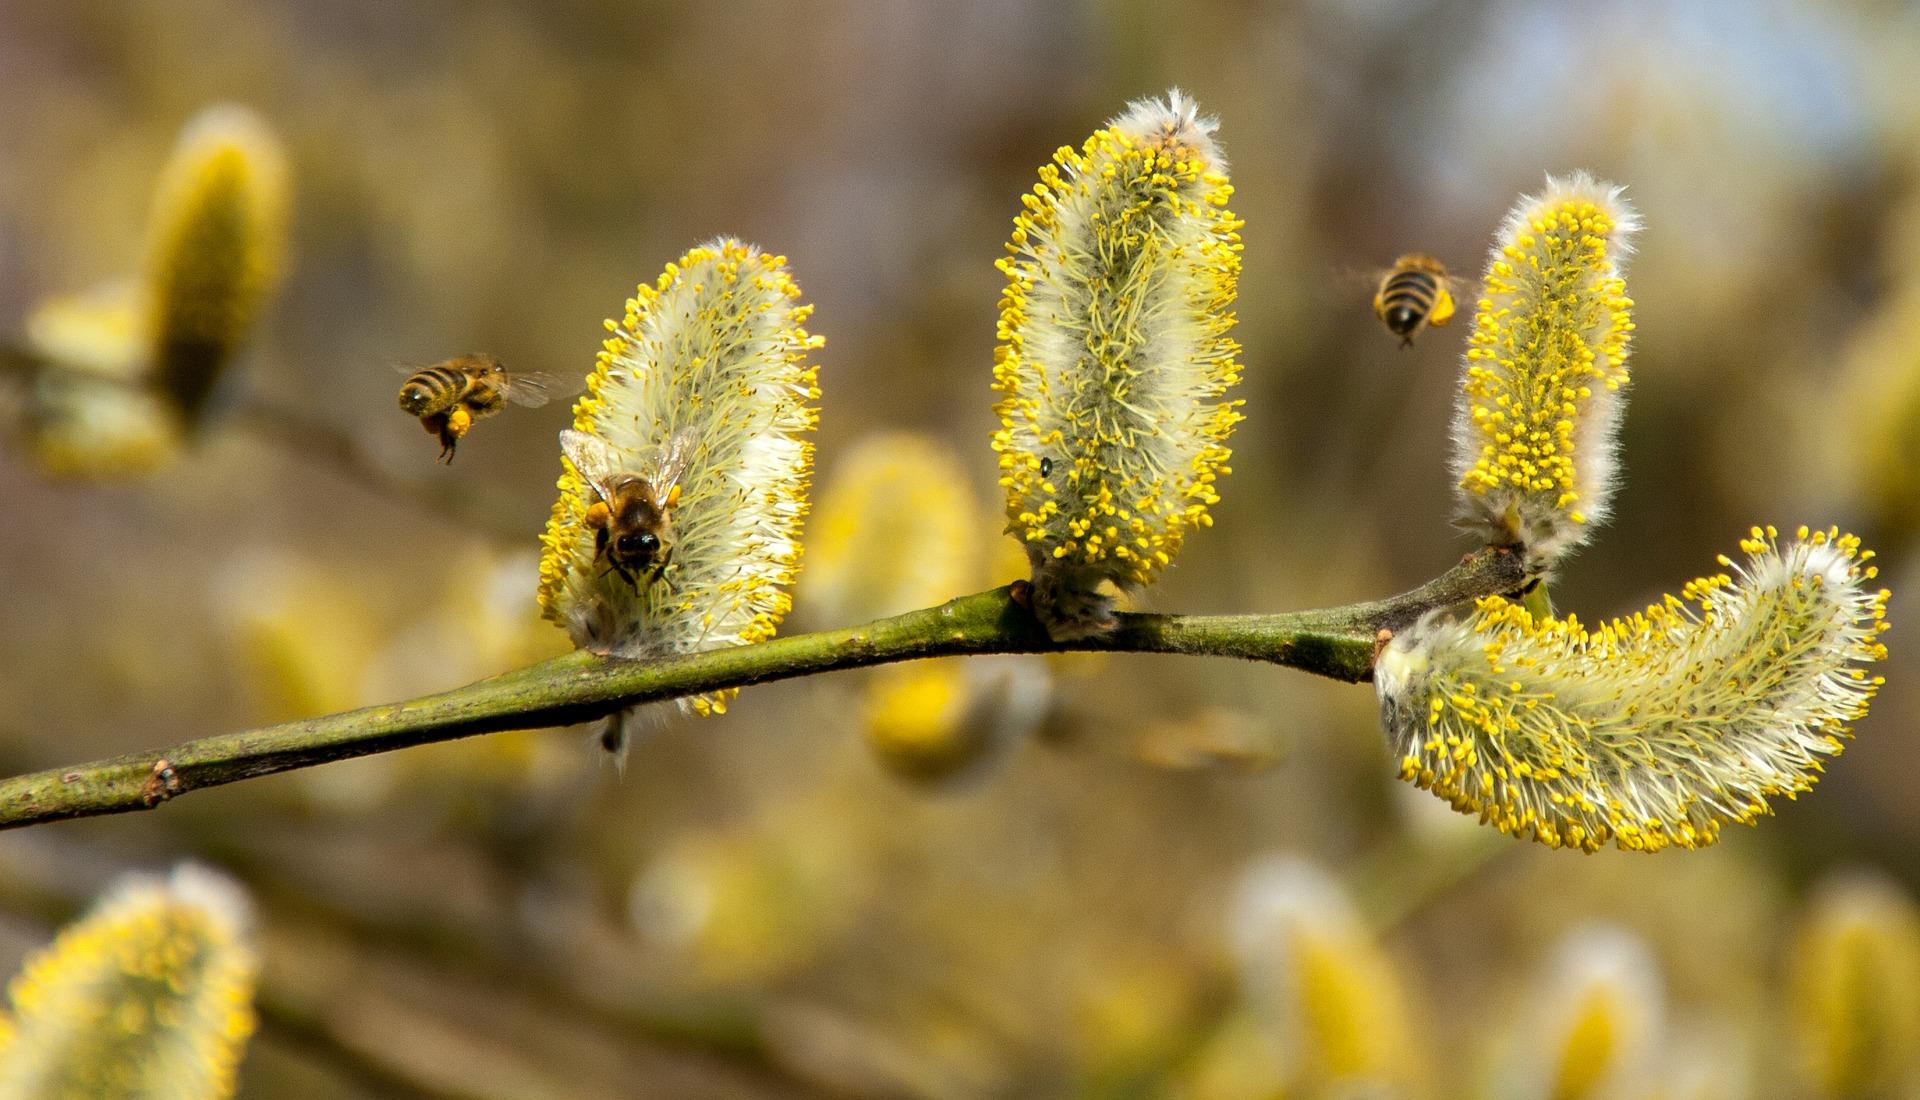 Heteken belül indul a tavaszi allergiaszezon